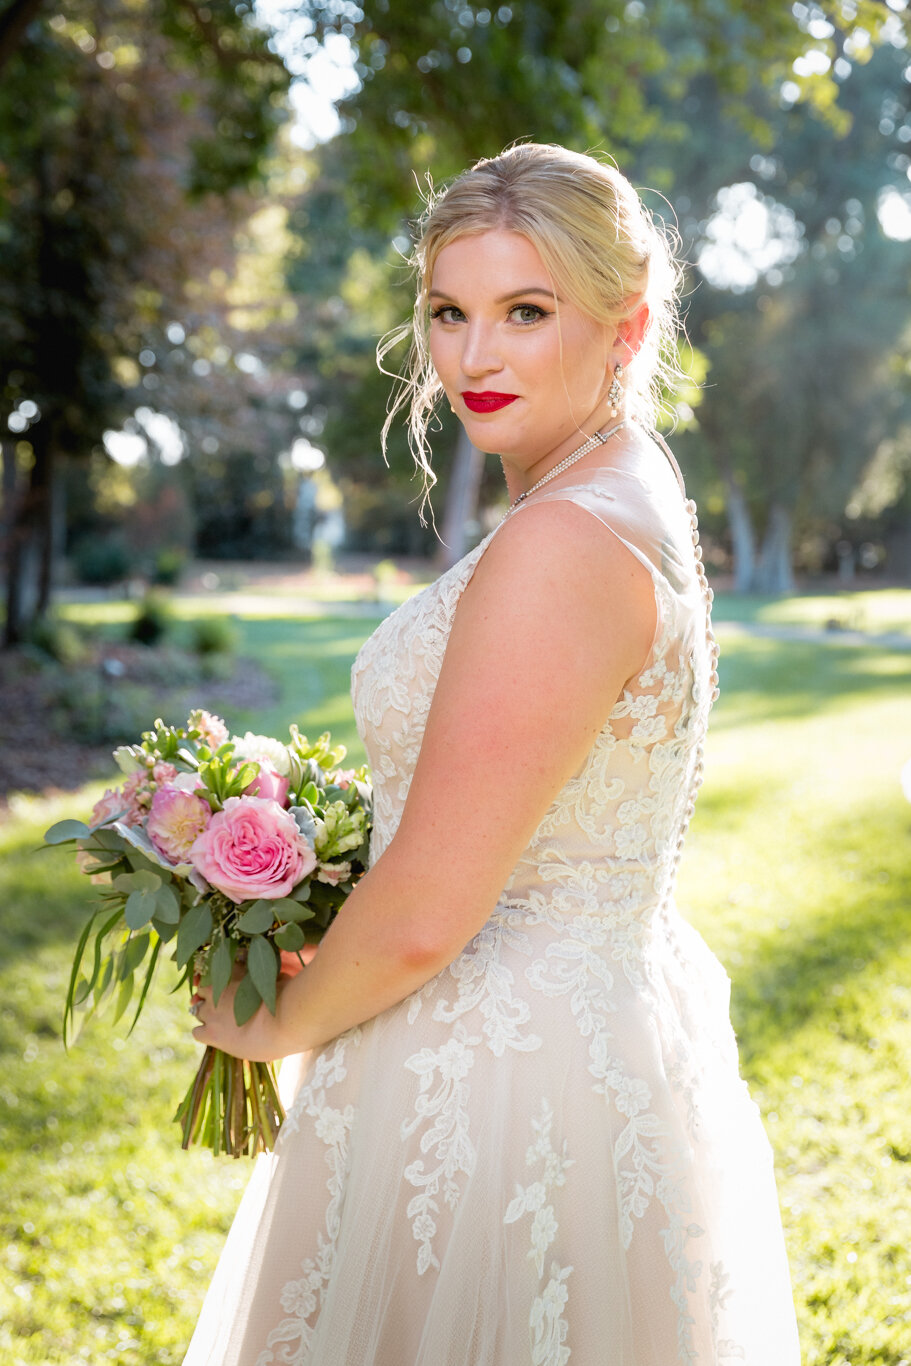 2019.08.24_Emily-Ashir-Wedding-at-the-Maples-6104.jpg